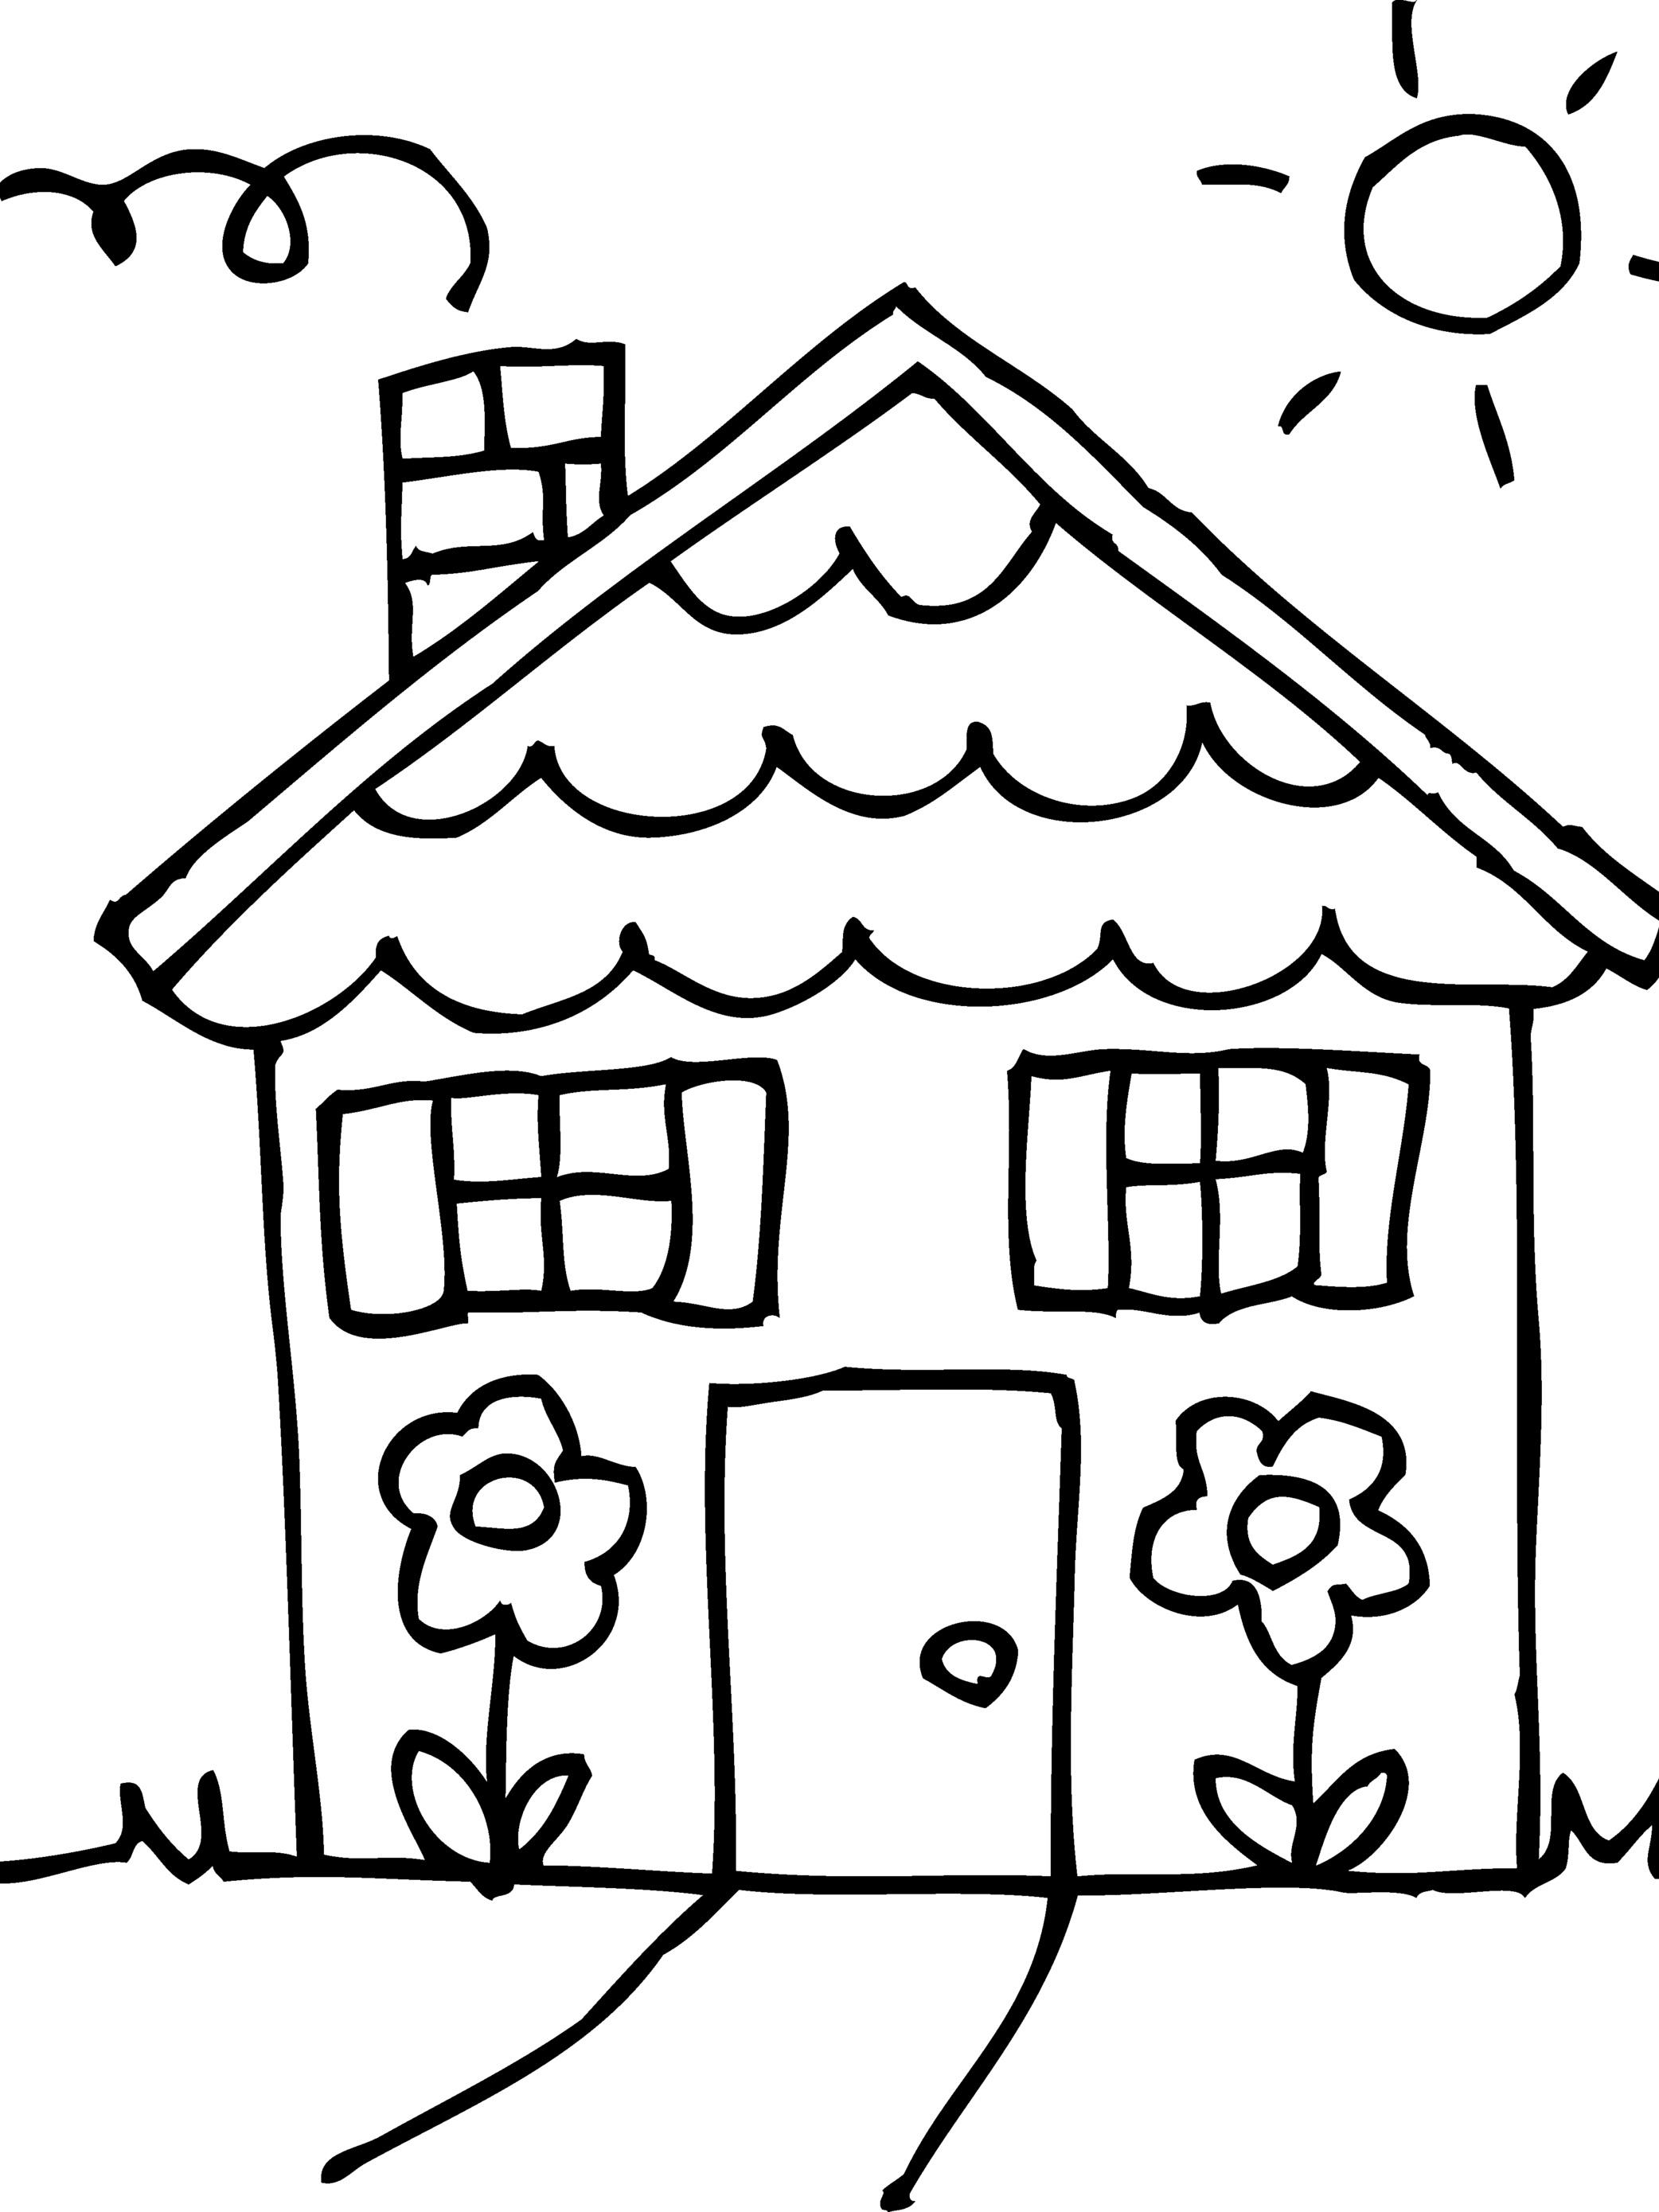 pngkey.com-white-house-png-12348.jpg